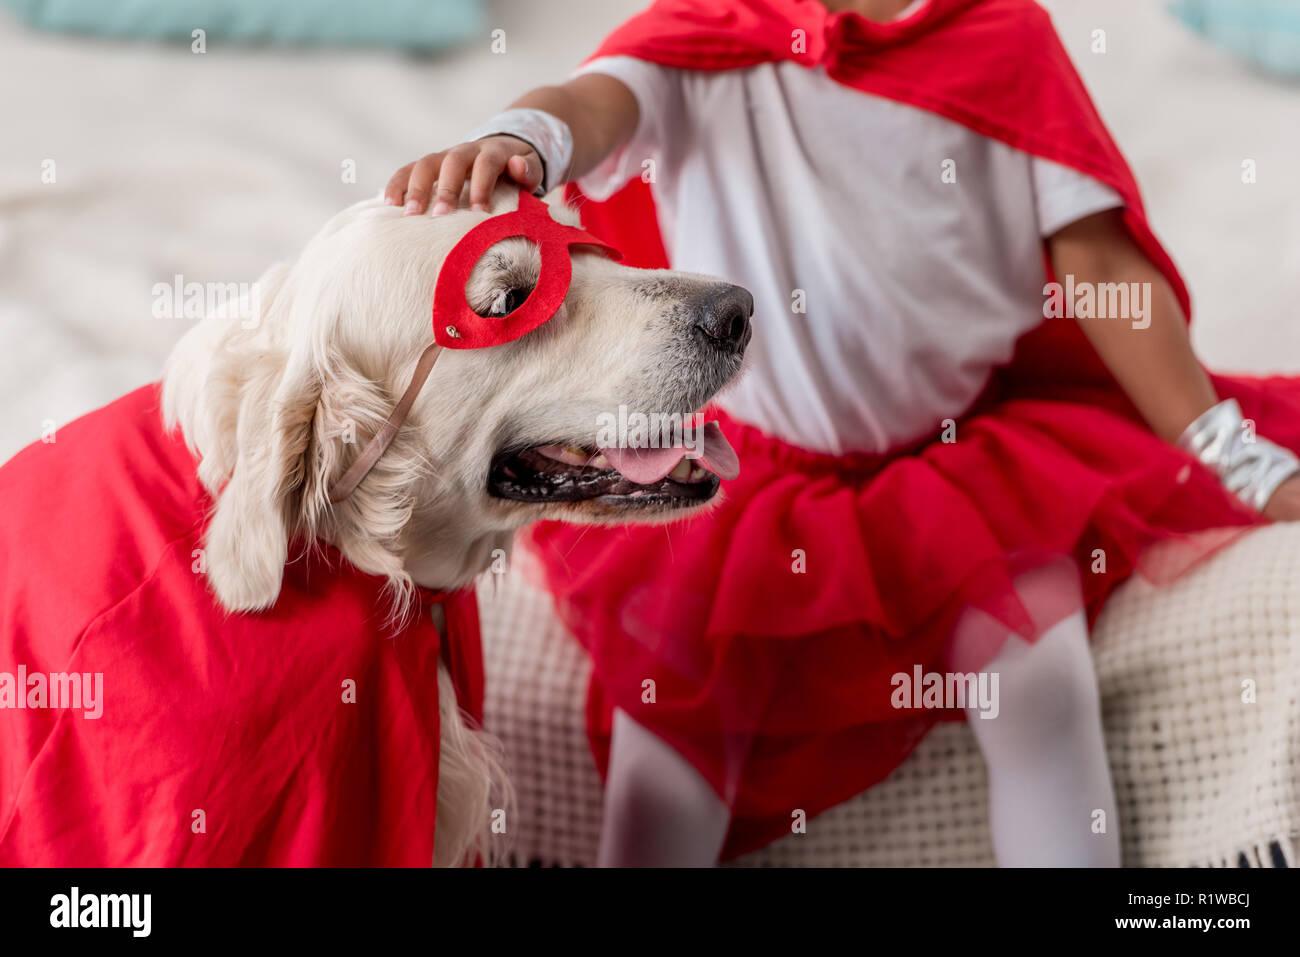 Partial view of hand petting happy golden retriever dog in superhero costume Stock Photo